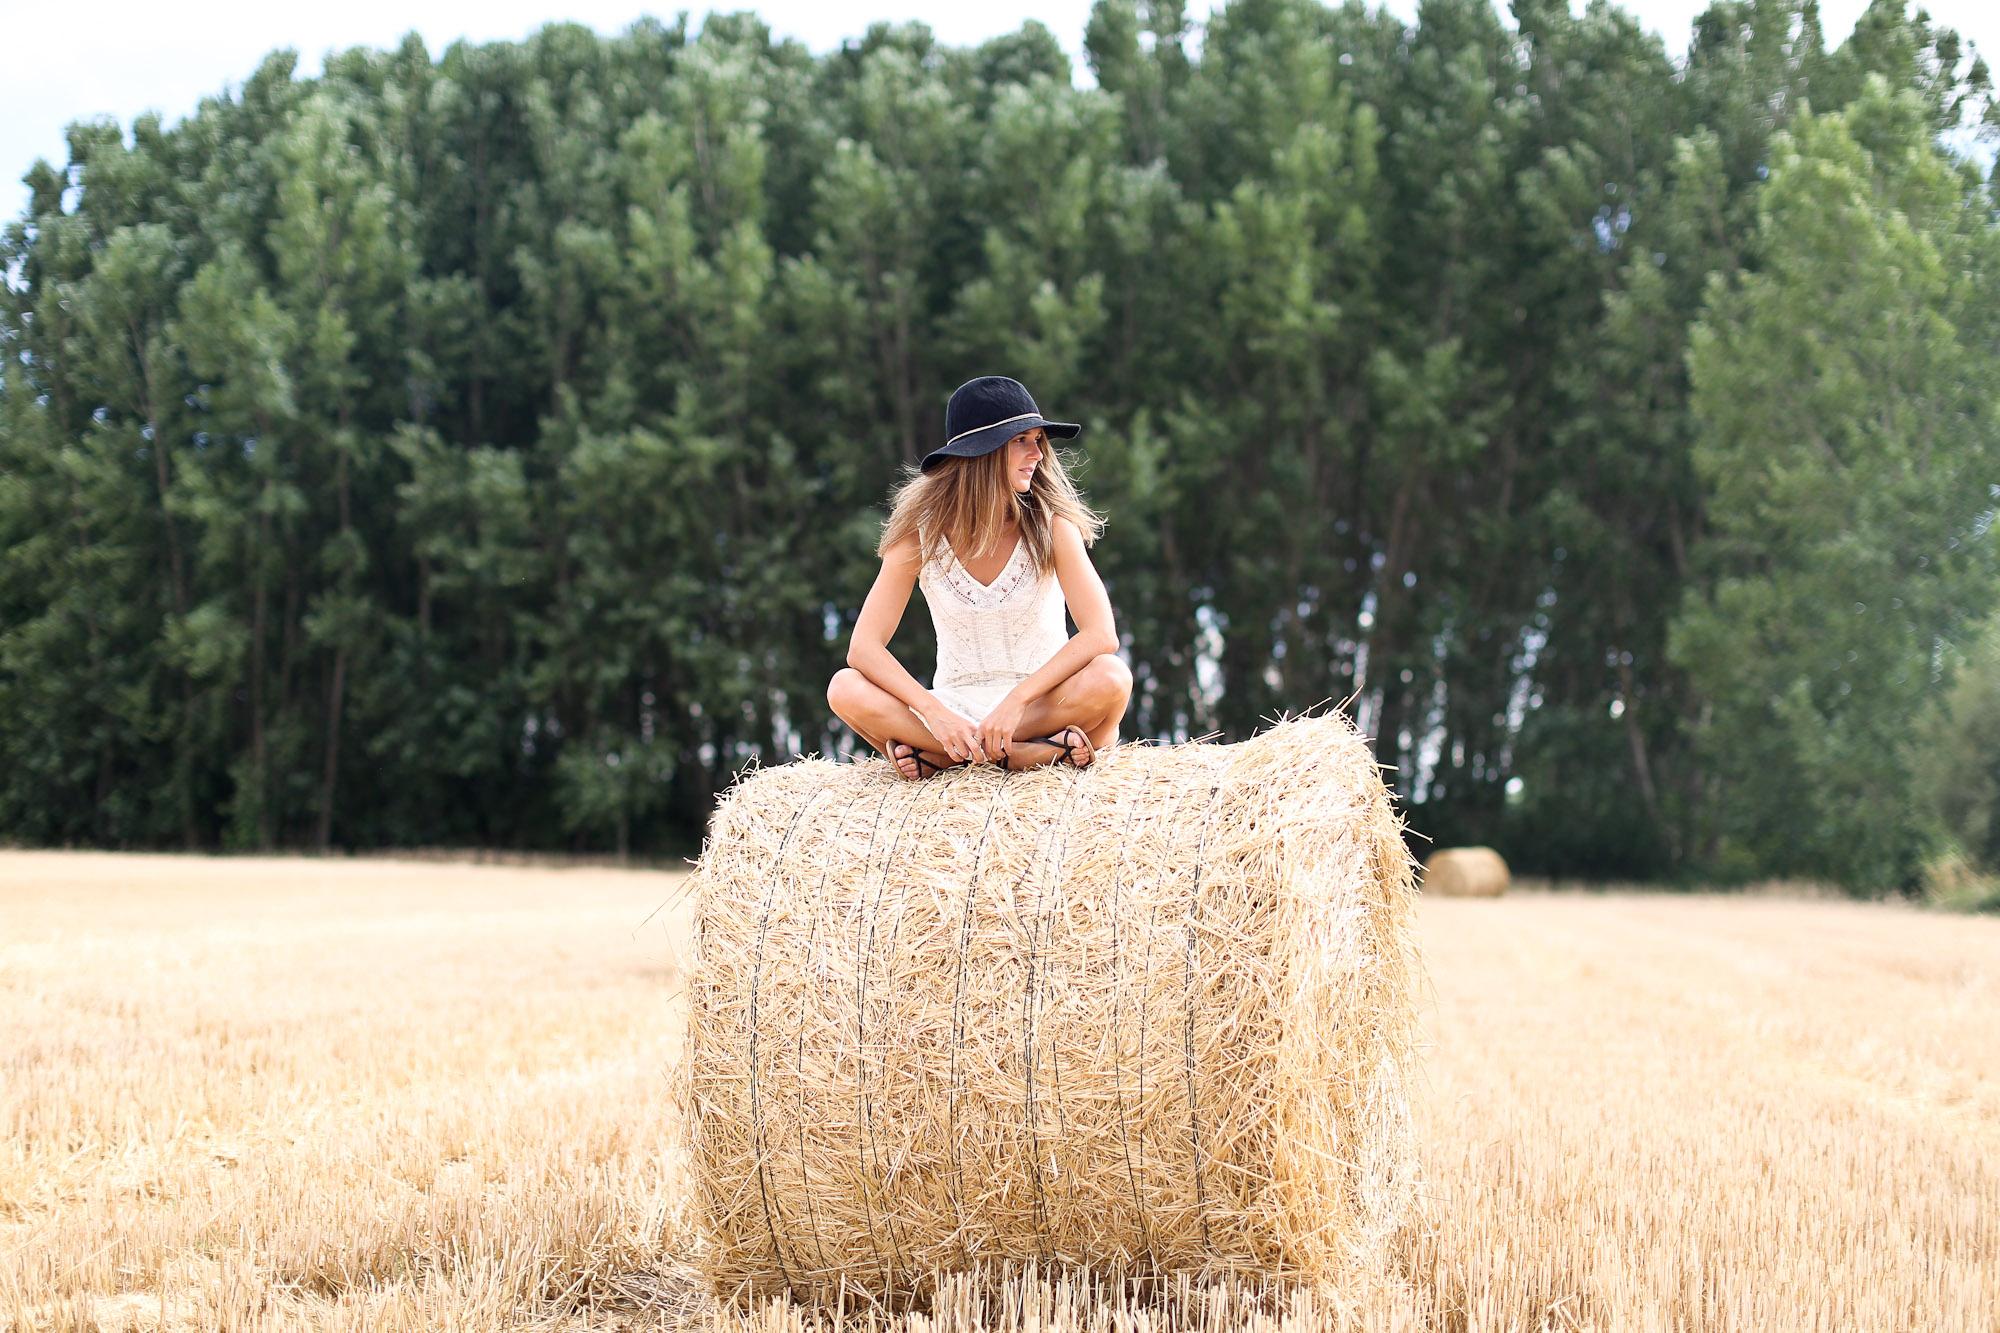 Clochet_sandro_anik_leather_Bag_long_crochet_dress_fedora_hat-8